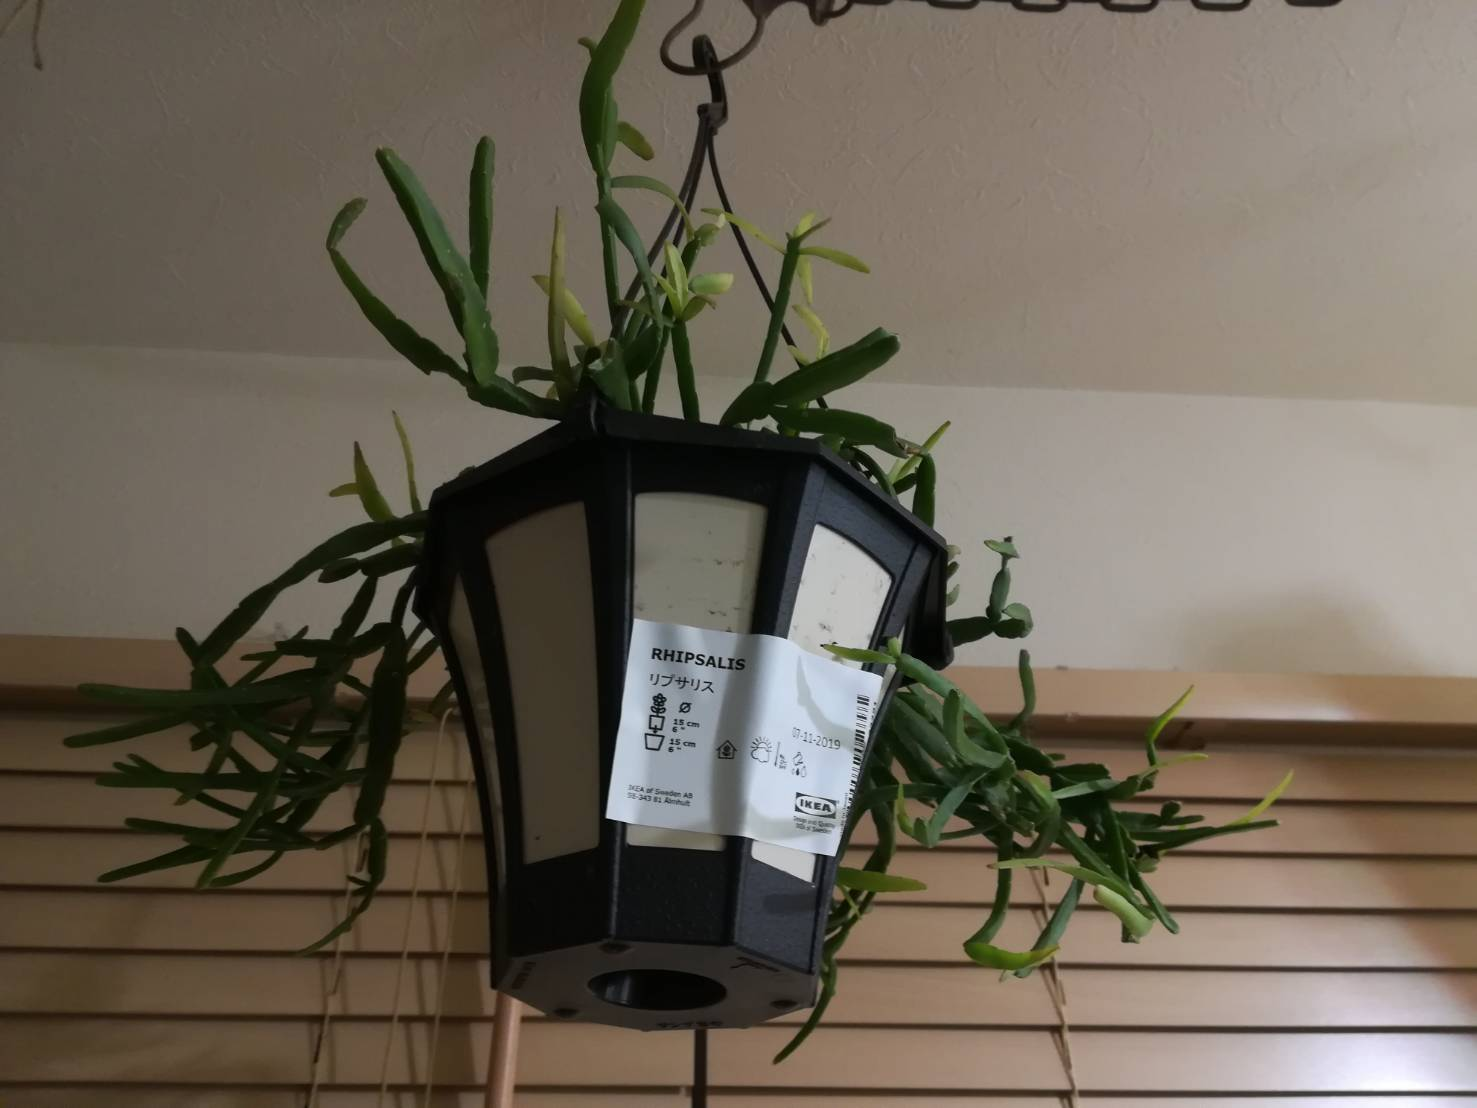 IKEA植物「リプサリス」のハンギングプランターが可愛い。